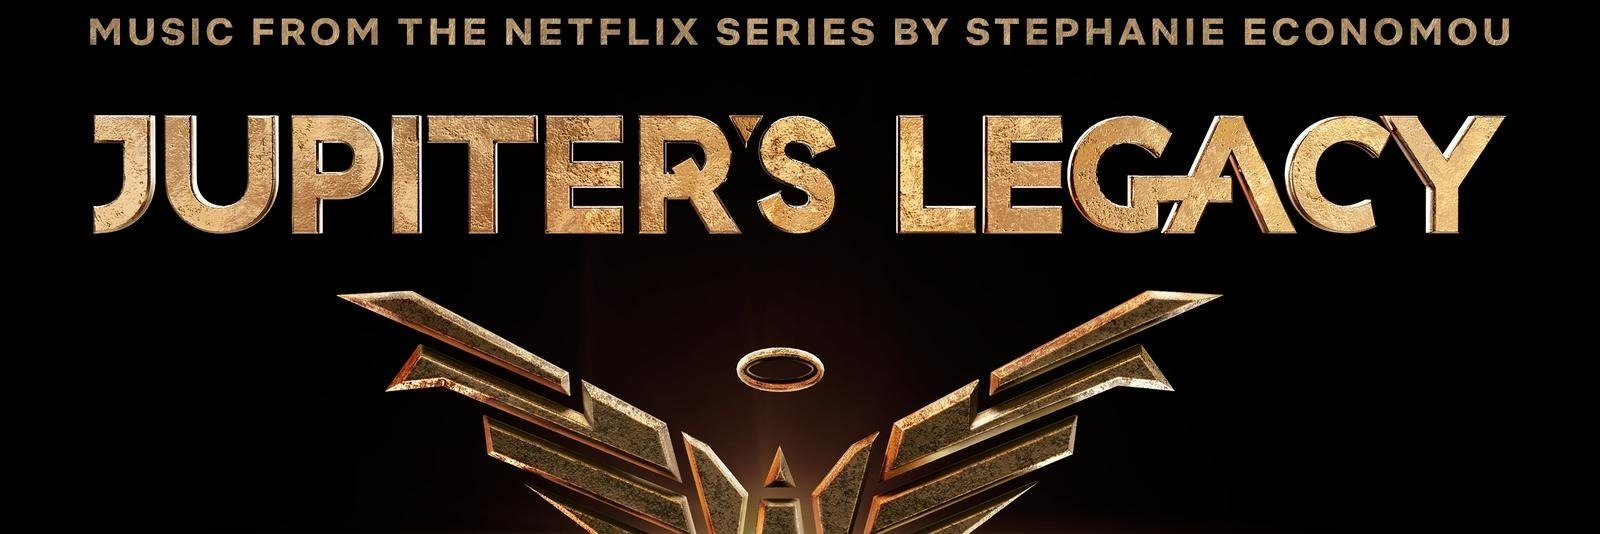 Przedstawiamy: Jupiter's Legacy (Music From the Netflix Series)